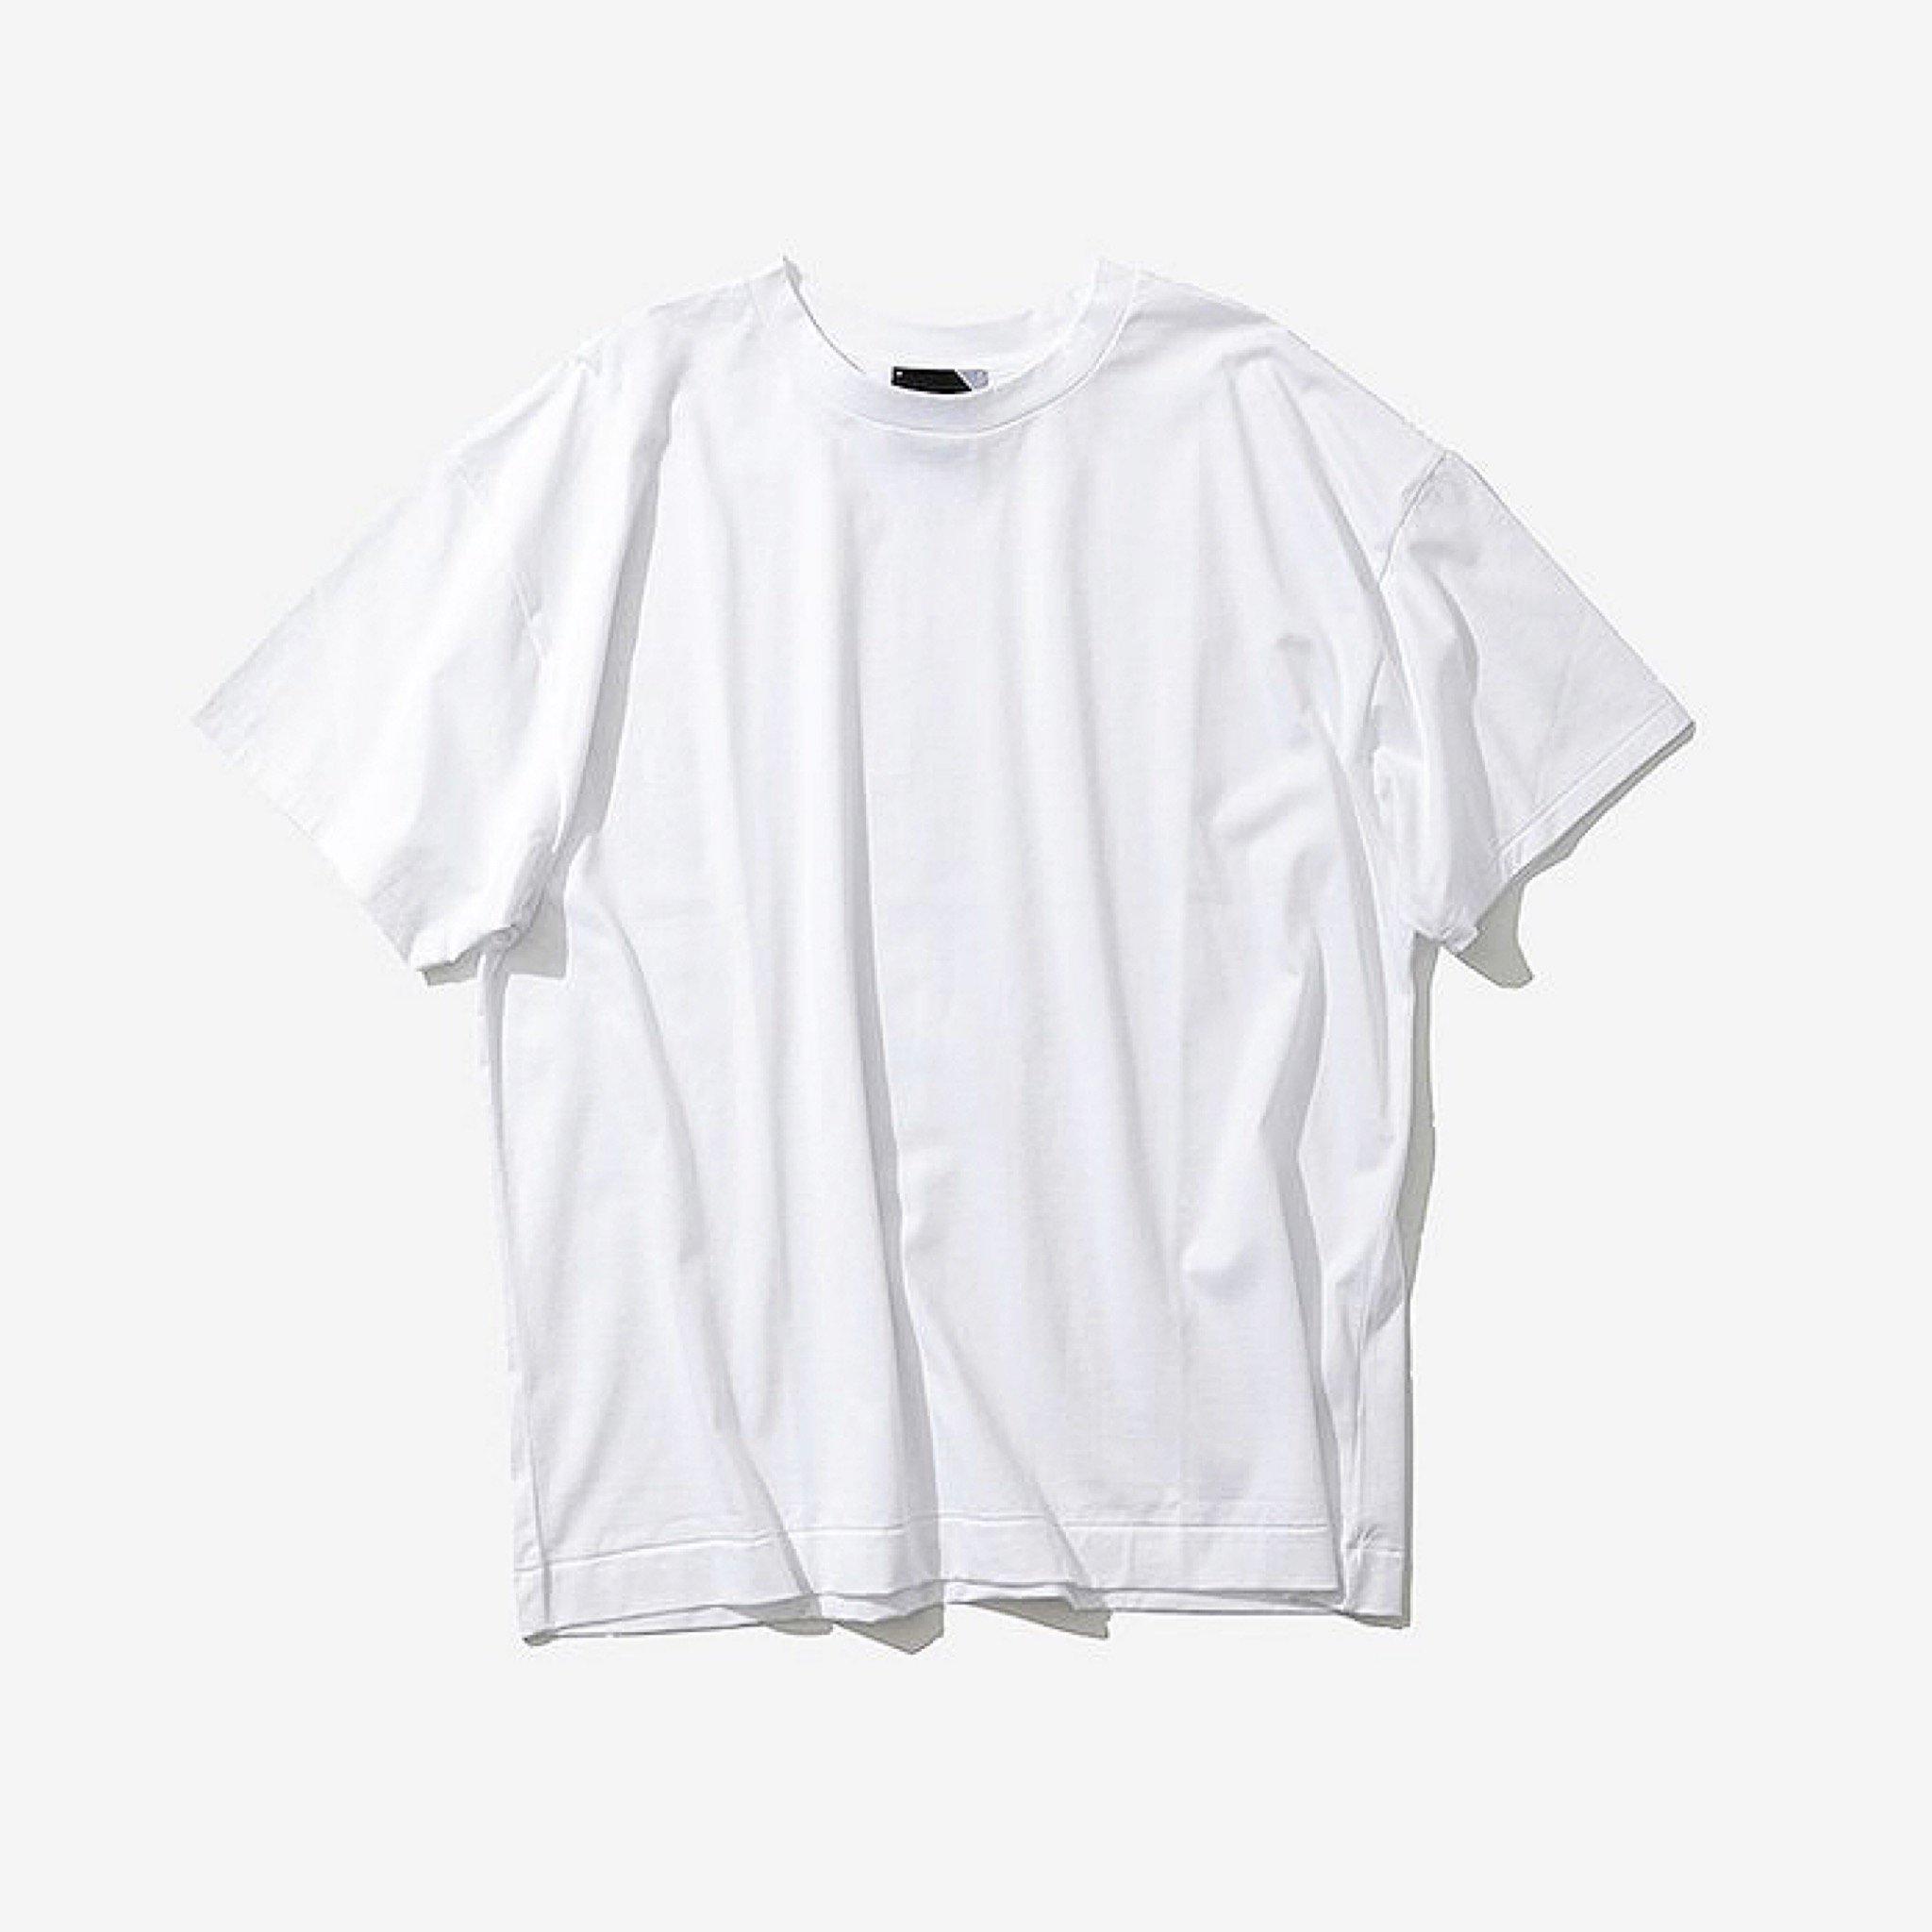 ATON-OVERSIZED T-SHIRTS WHITE 19ss